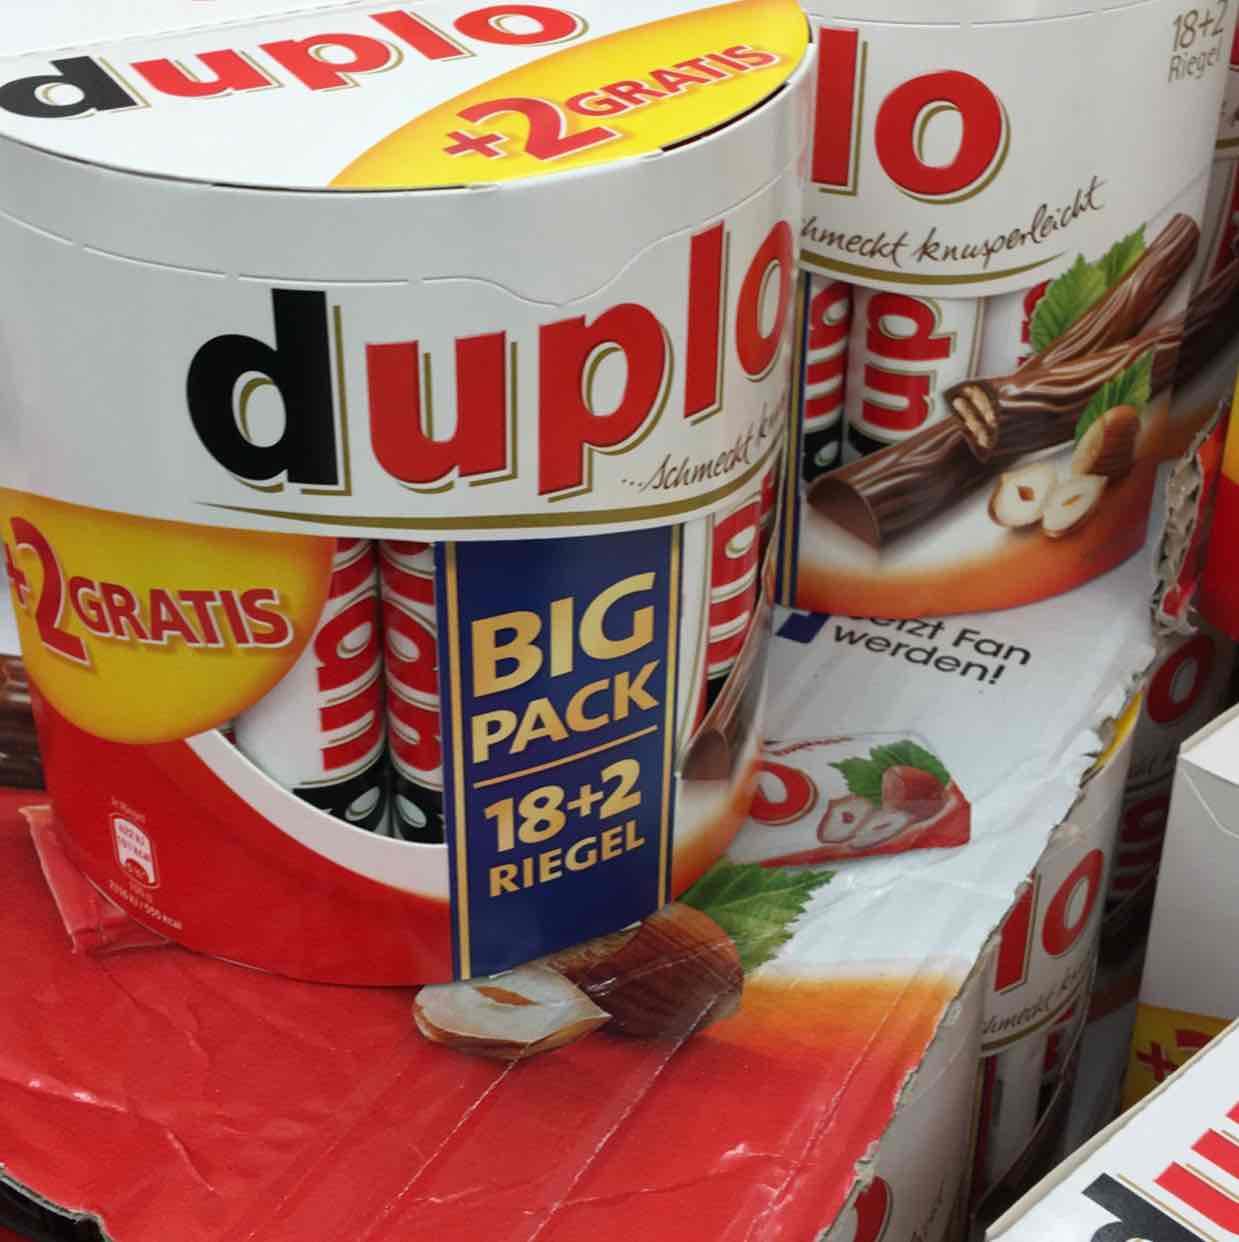 Duplo Big Pack 20 Stück nur 2,49€  Lokal HH Penny Eidelstedter Marktplatz